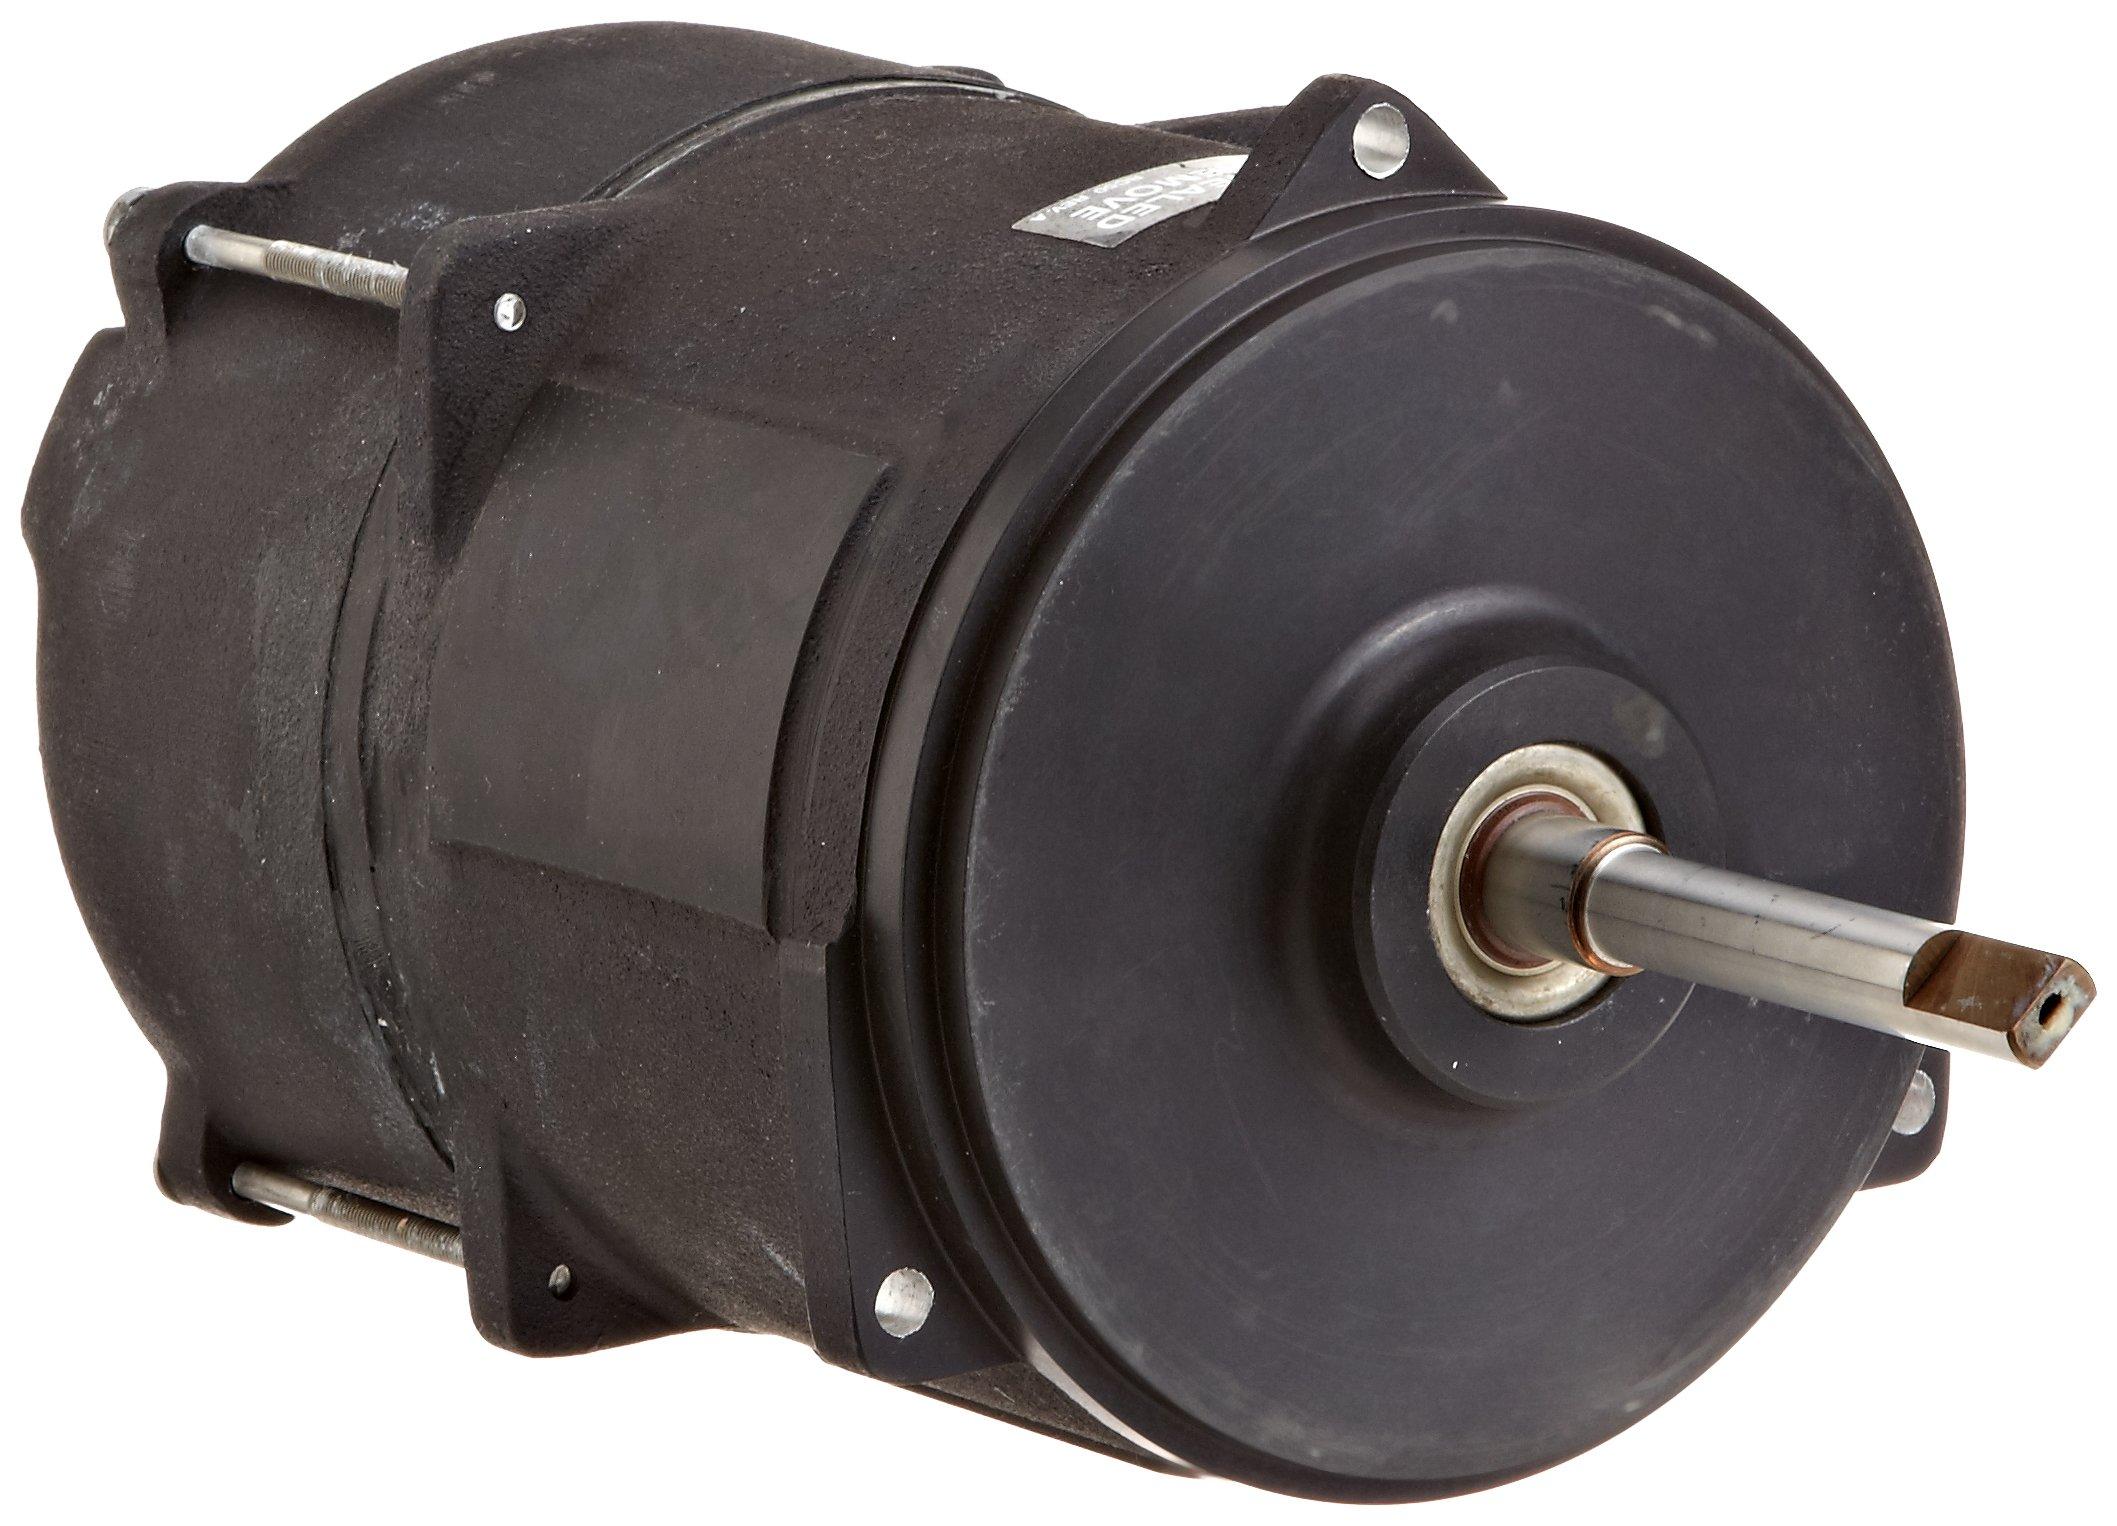 Hayward RCX4012 3/4-Horsepower Swivel Motor Replacement for Hayward Commercial Cleaner